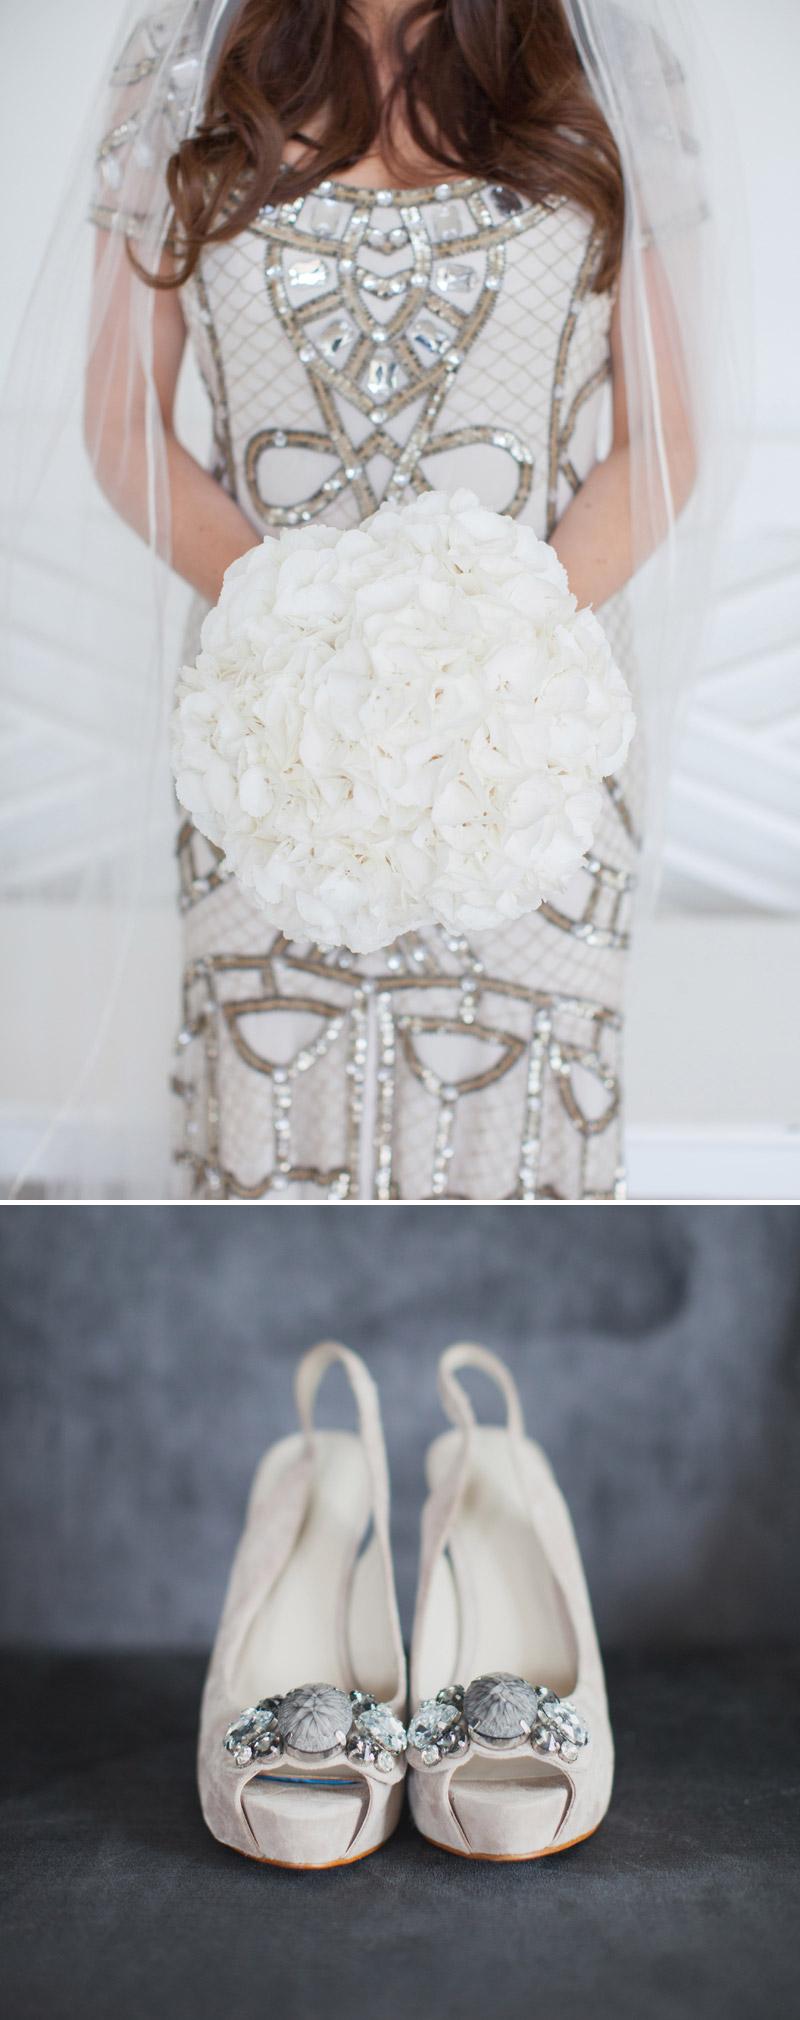 Zara wedding shoes archives rock my wedding uk wedding blog i ombrellifo Images